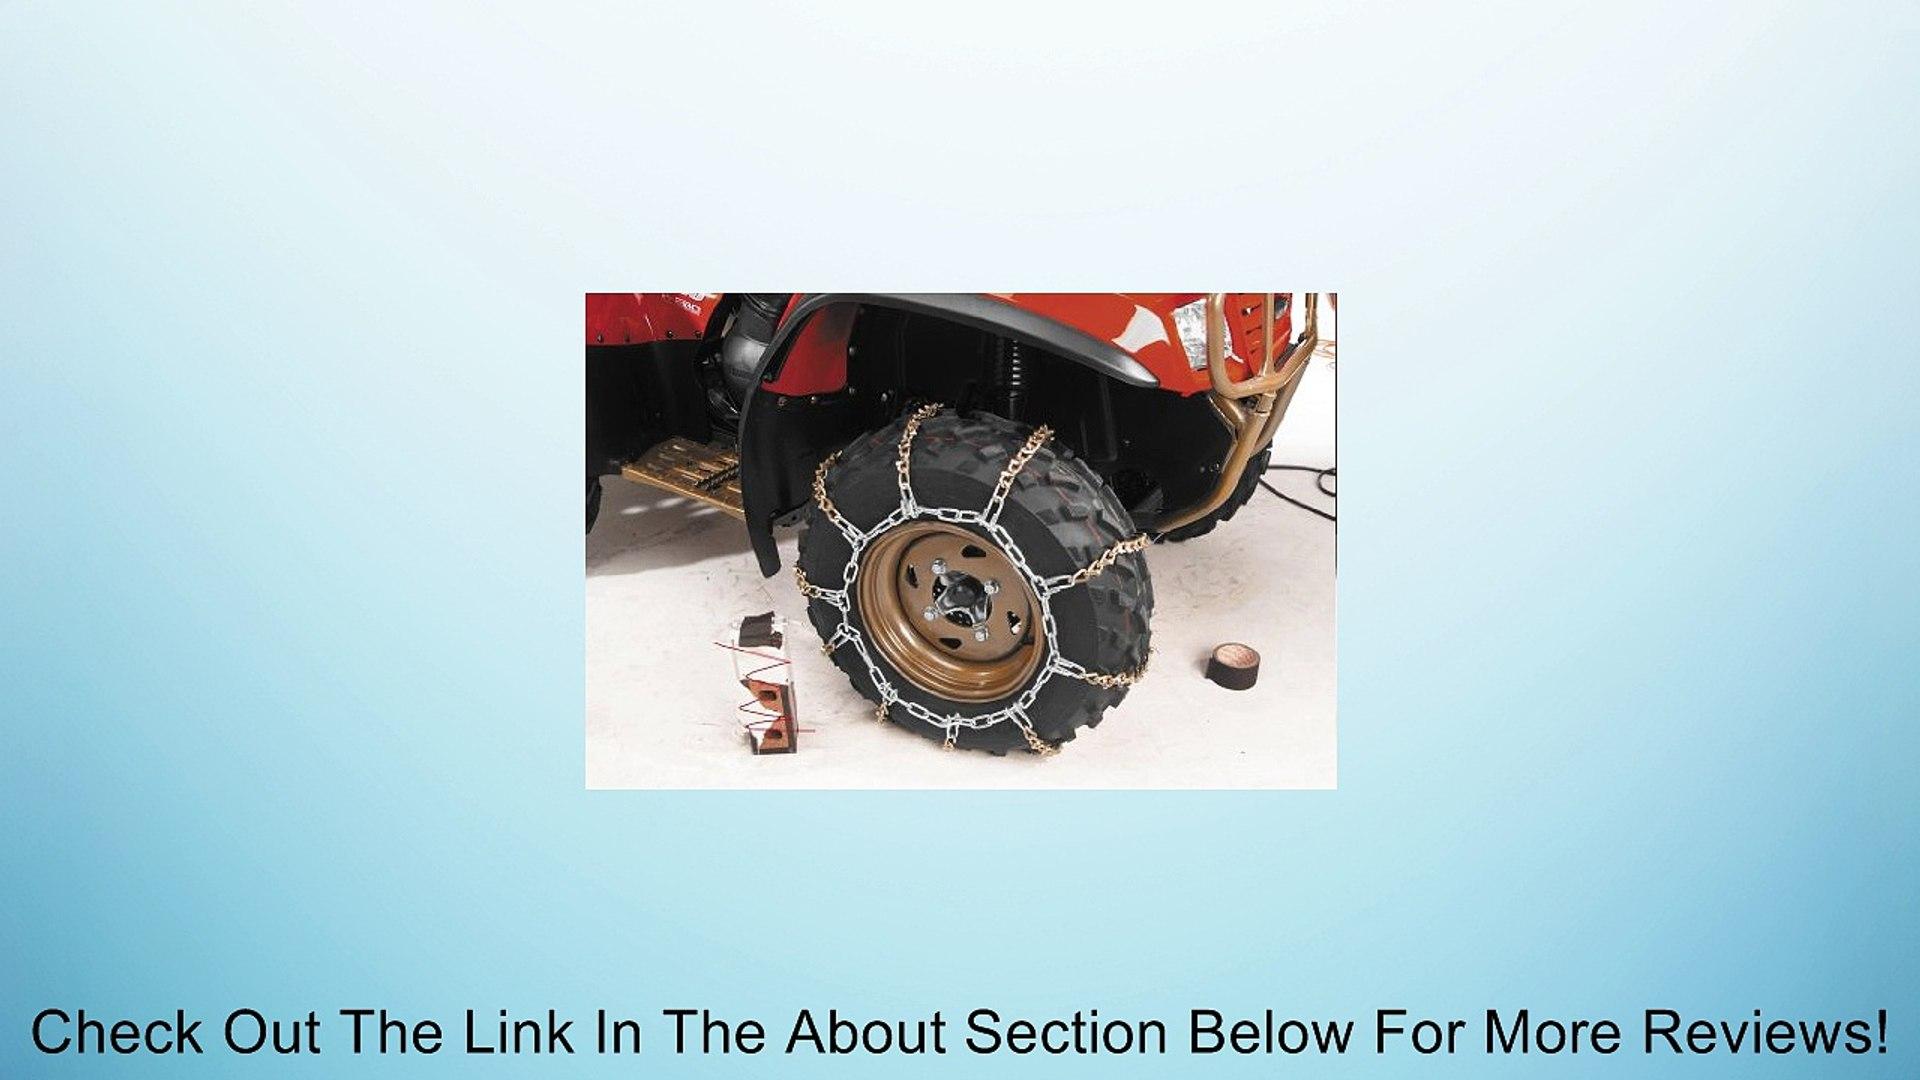 QuadBoss V-Bar Tire Chain - Large 40302/356-0822 2003 Arctic Cat 400 2x4 Auto, 1998-2002 Arctic Cat